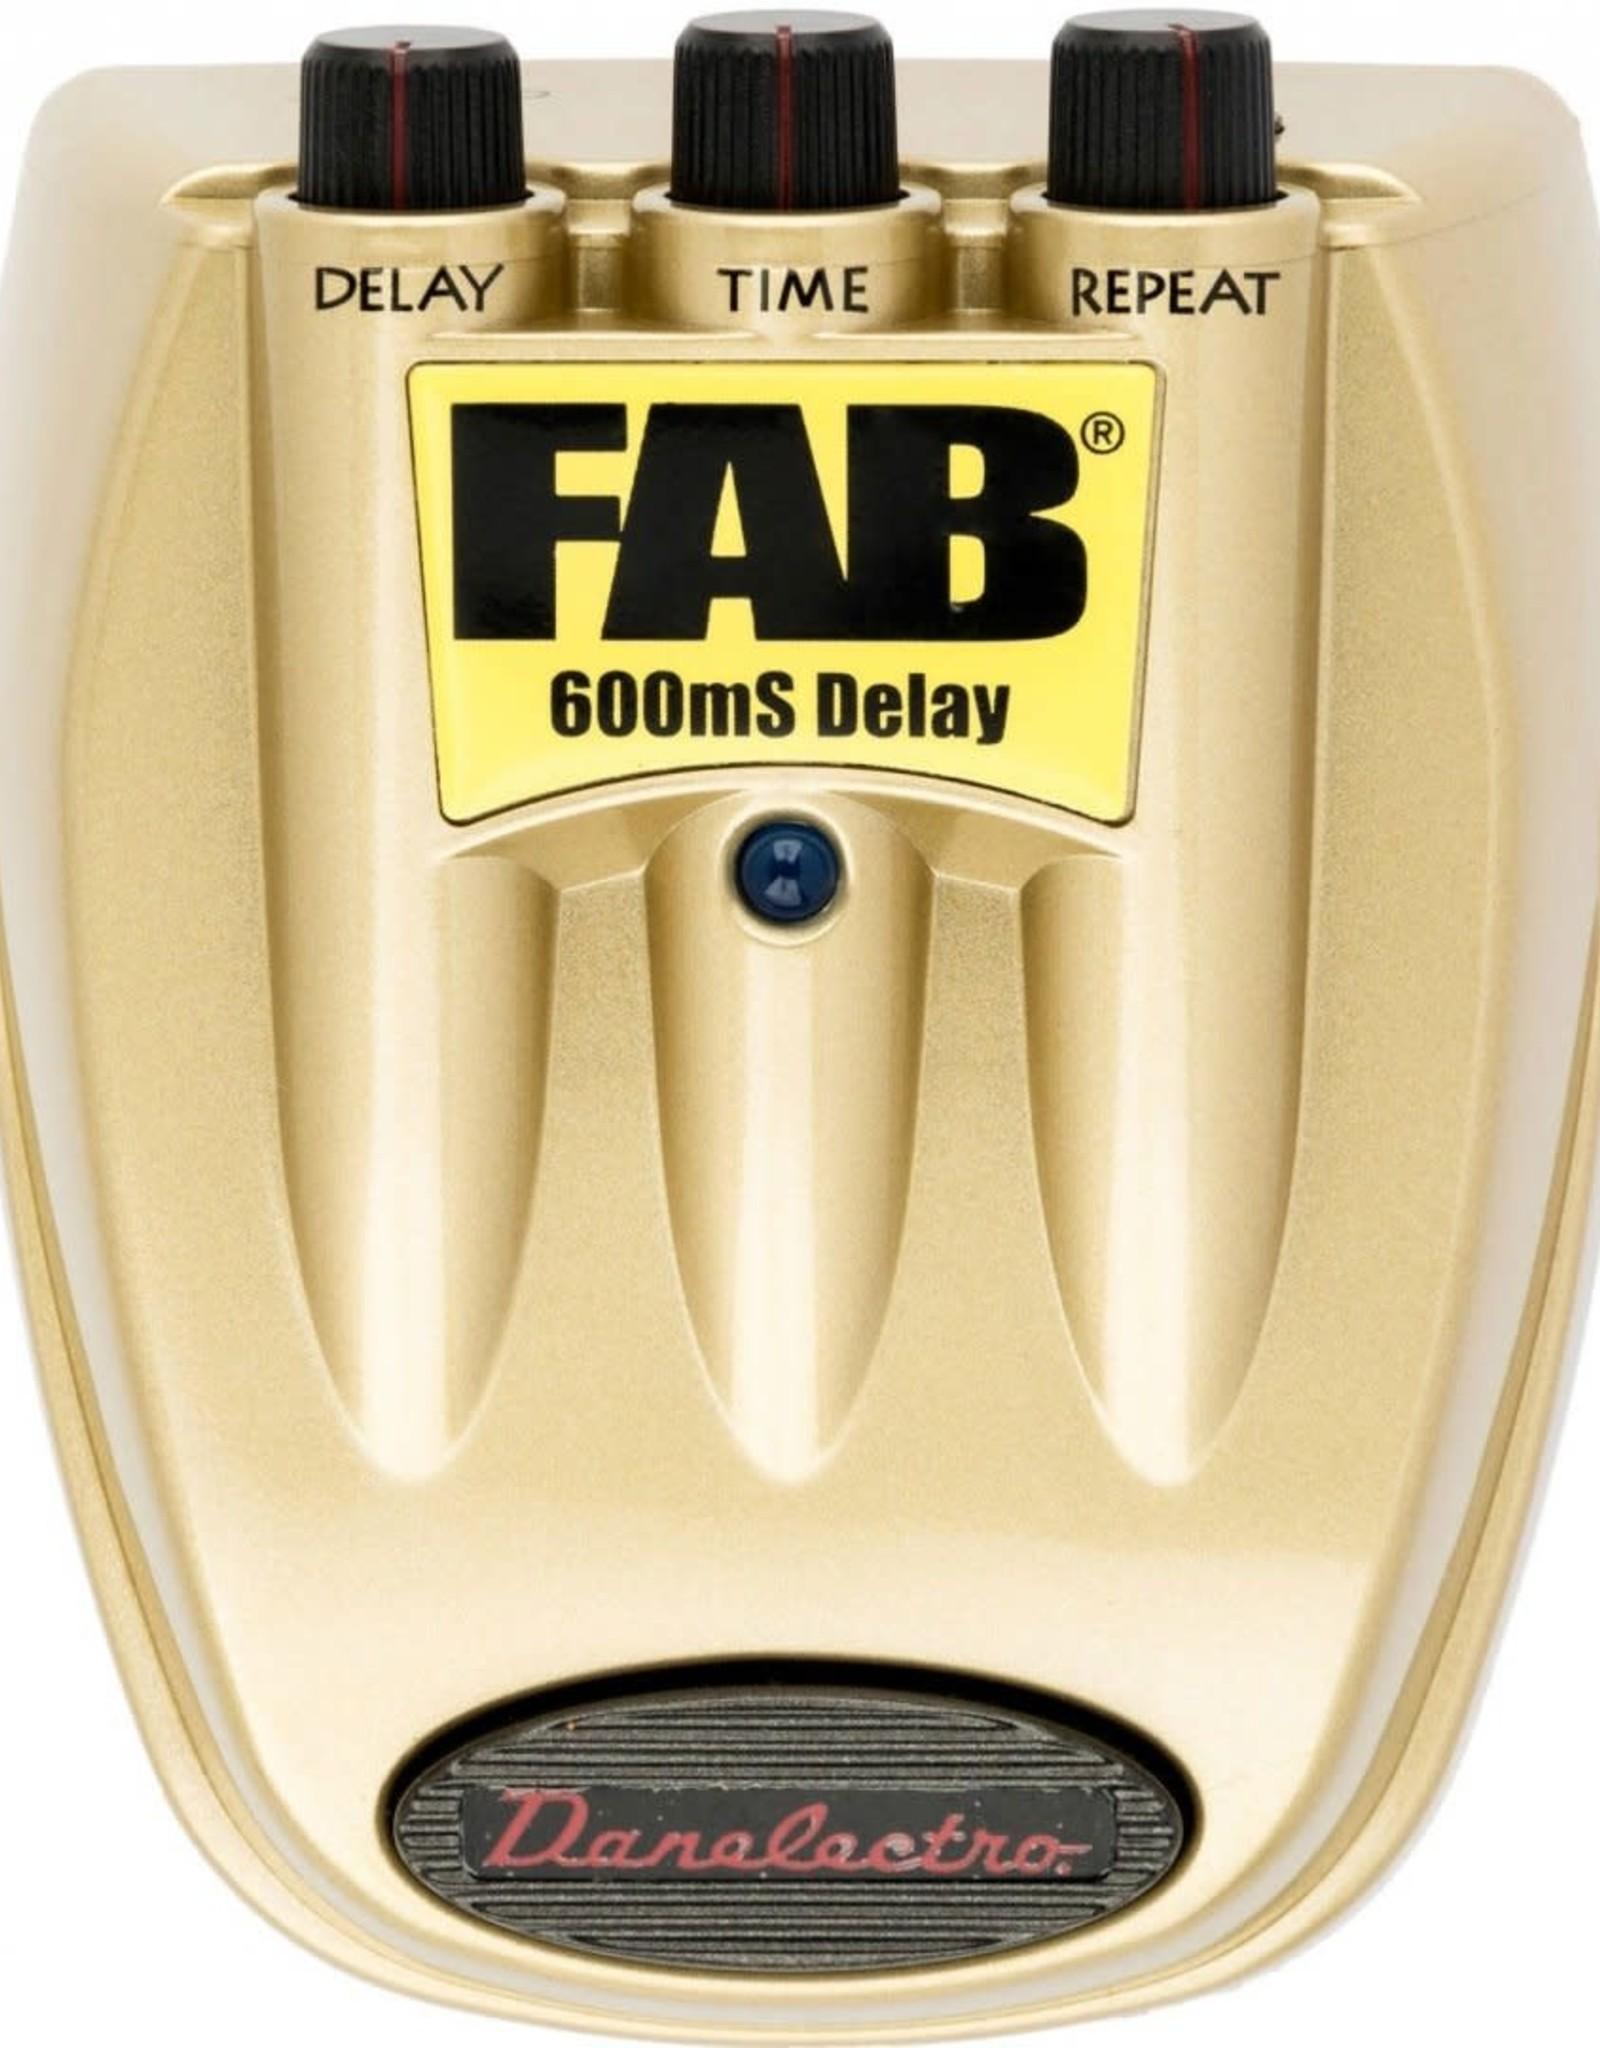 Danelectro Danelectro - FAB 600MS Delay Pedal